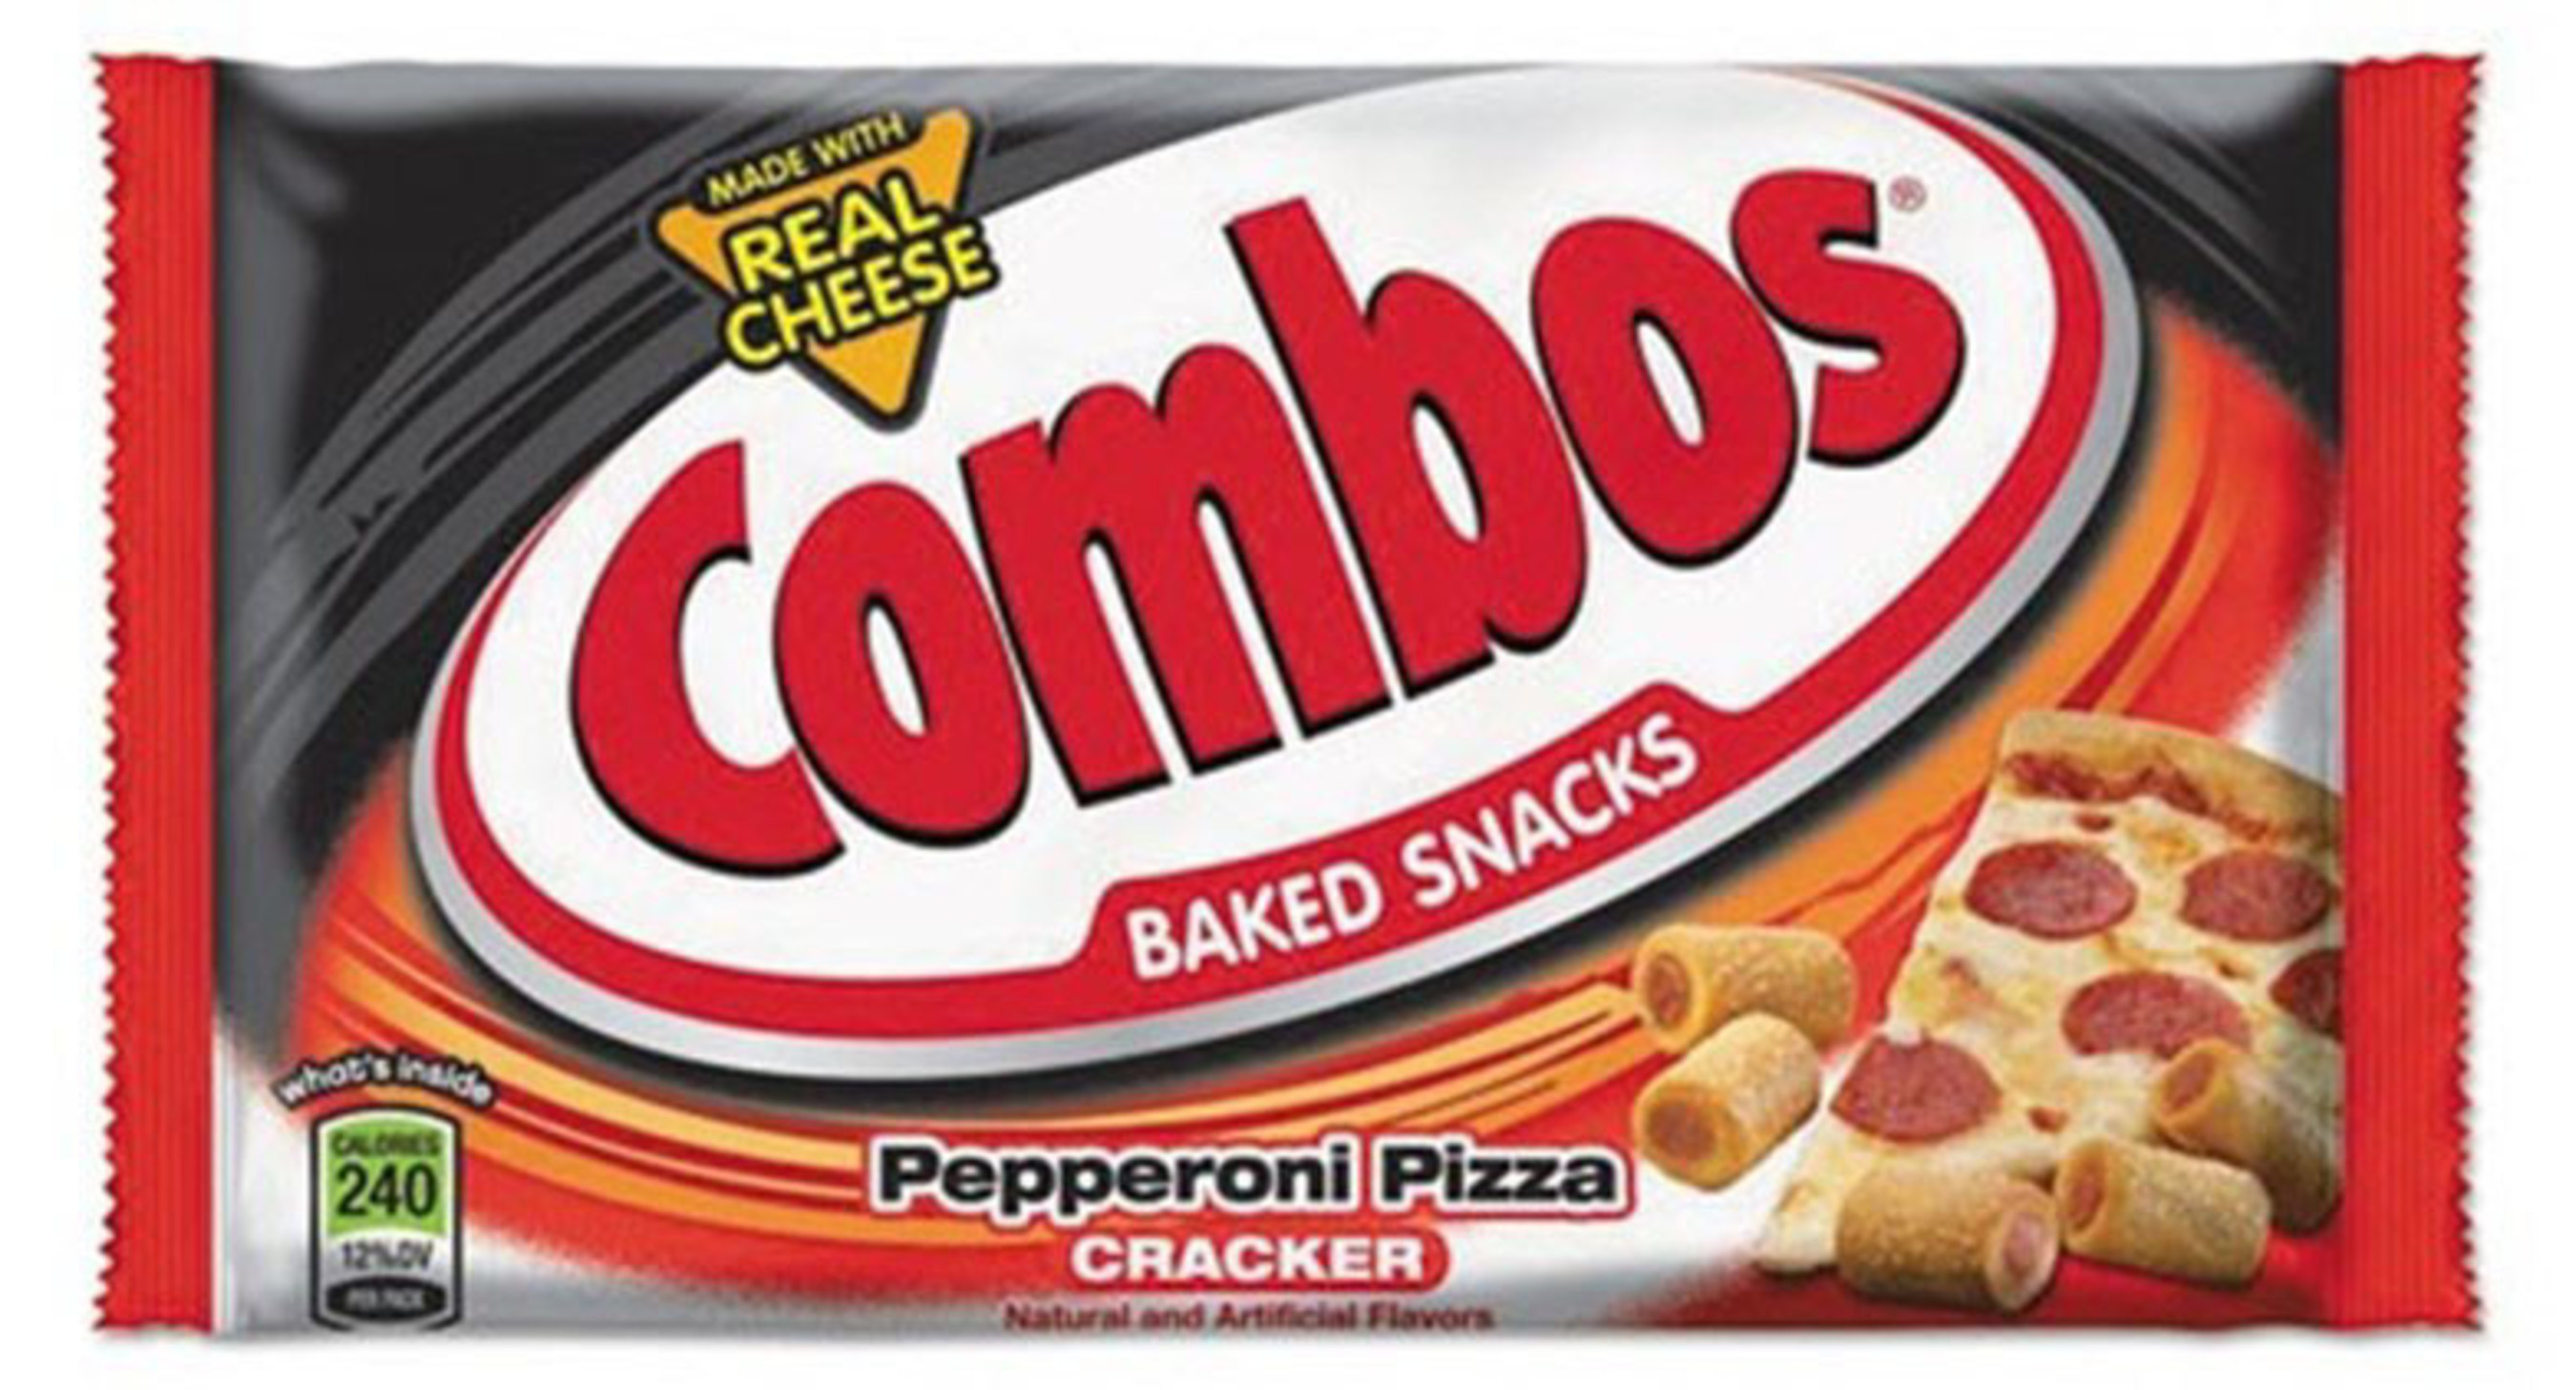 COMBOS PEPPERONI PIZZA CRACKER - SINGLES - 1.70 OZ - 18 CT - 12/CA